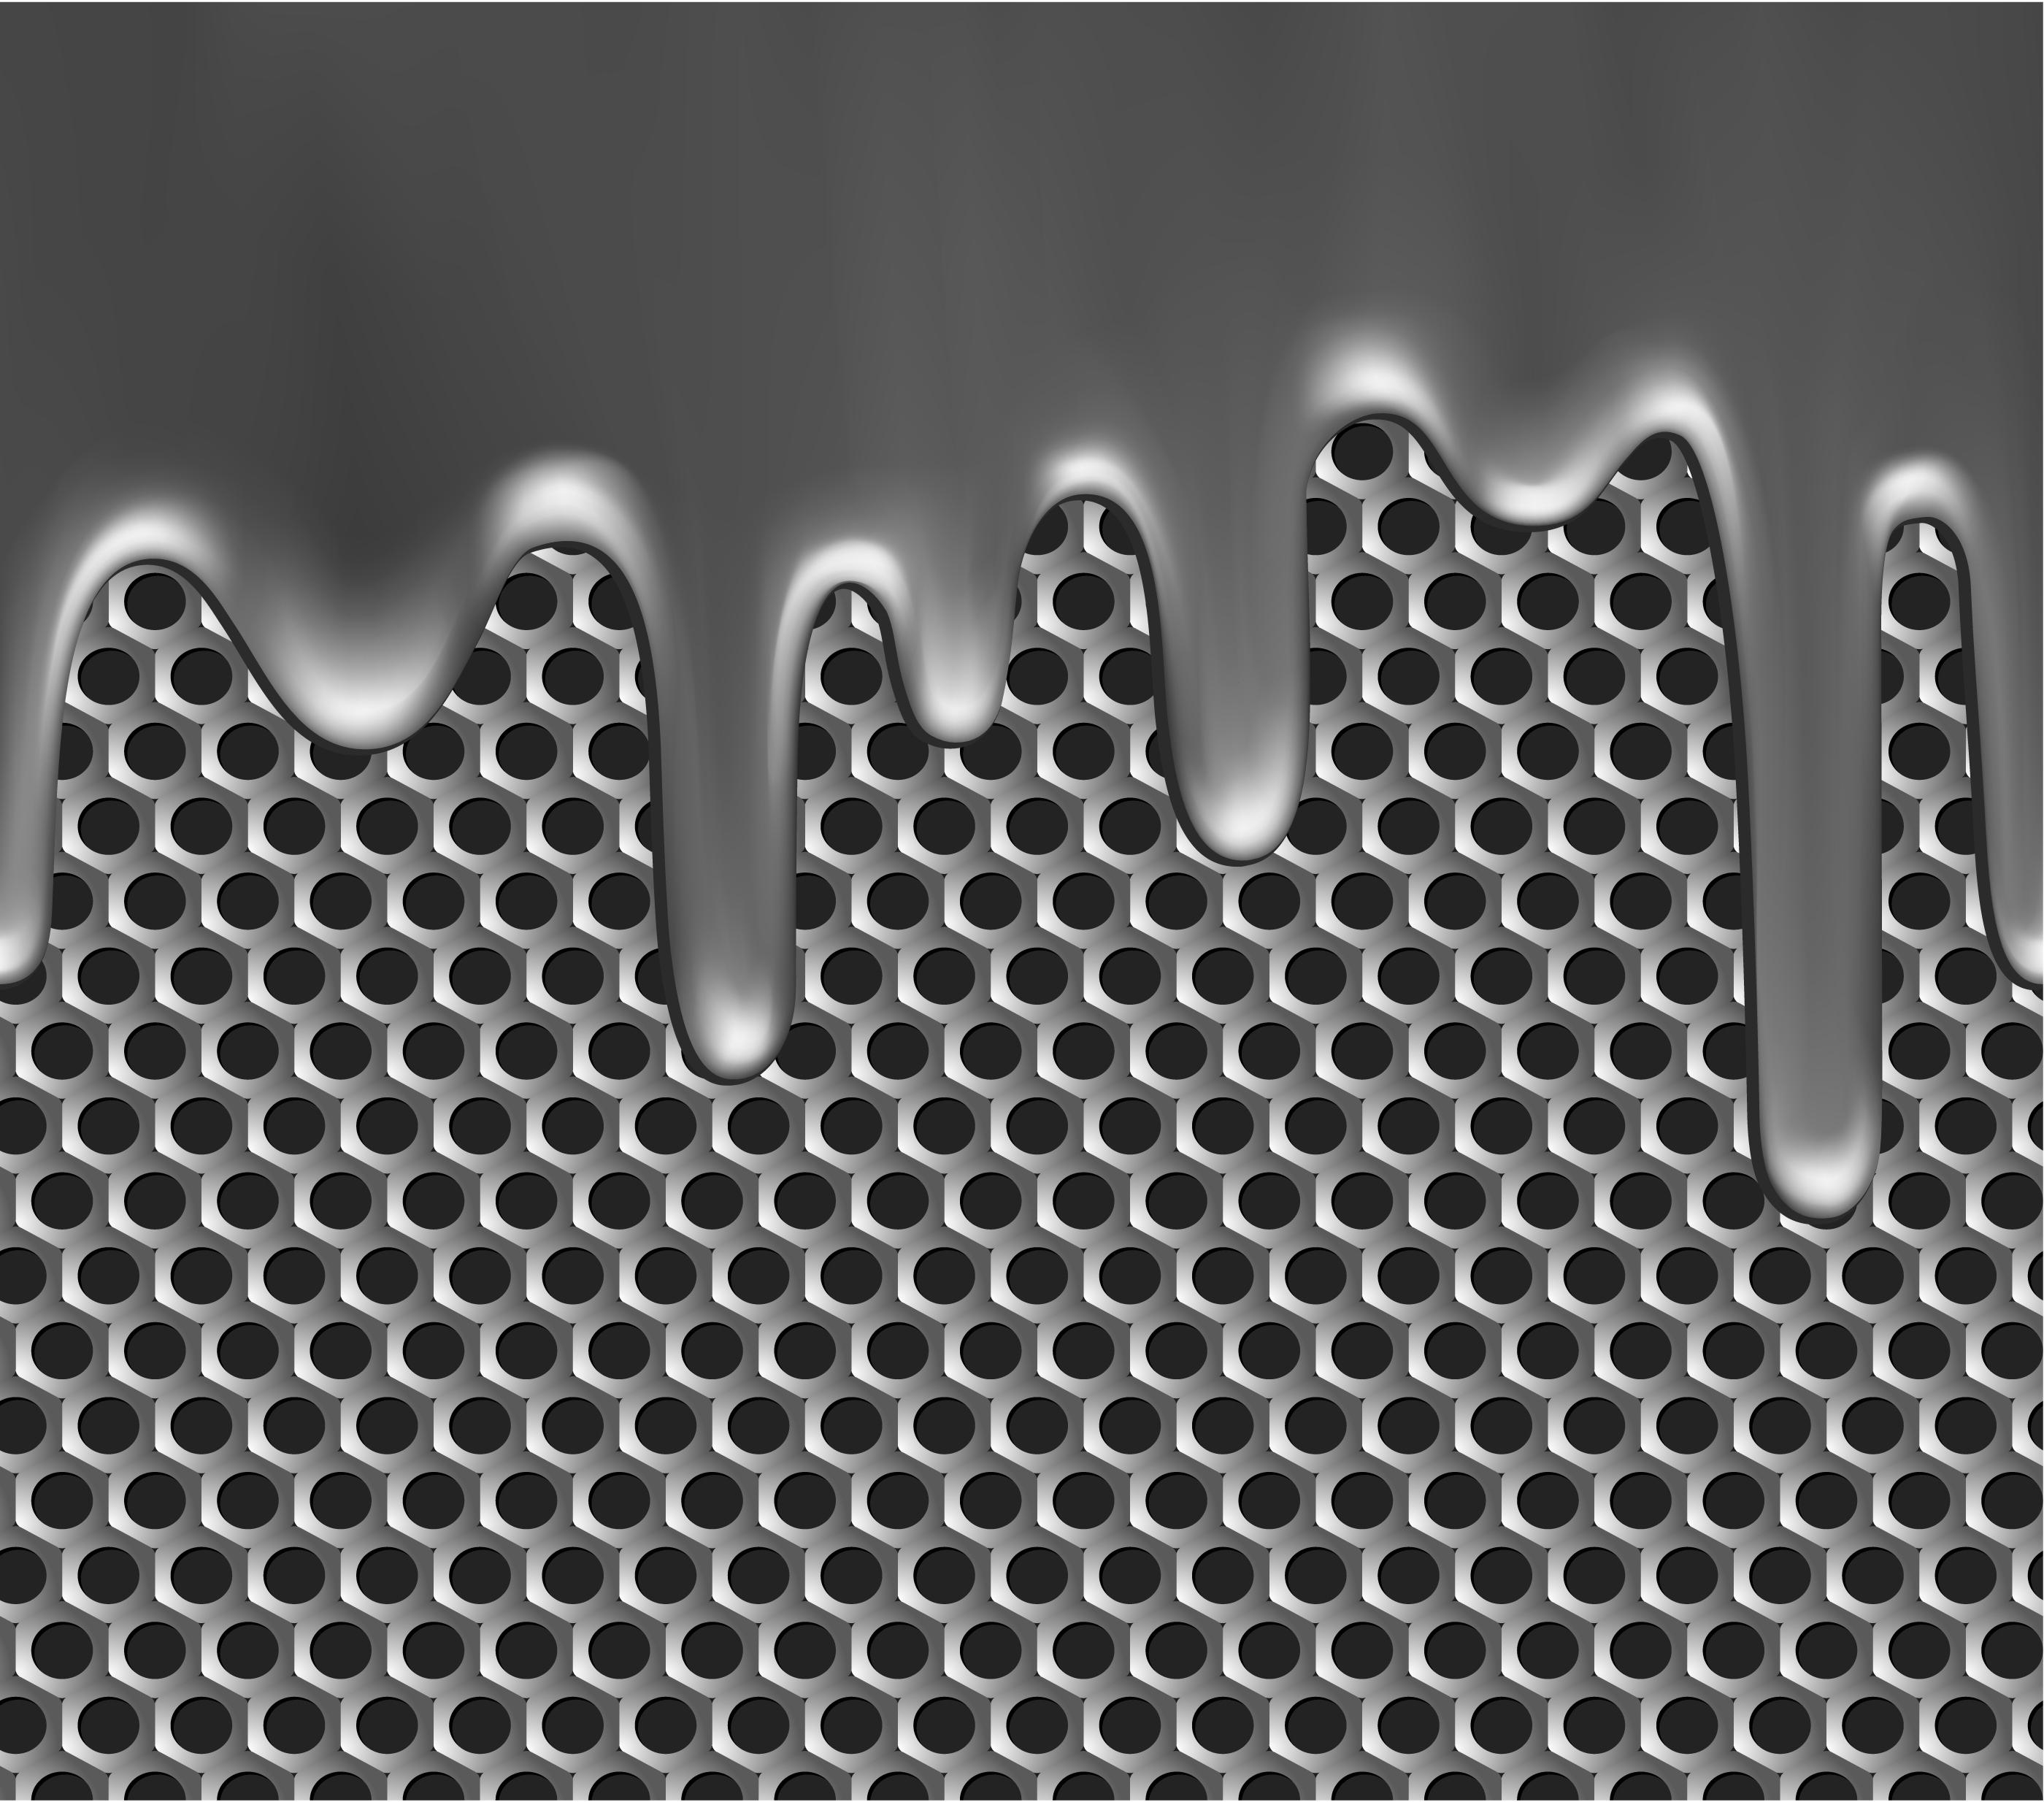 metal 3d printing takes